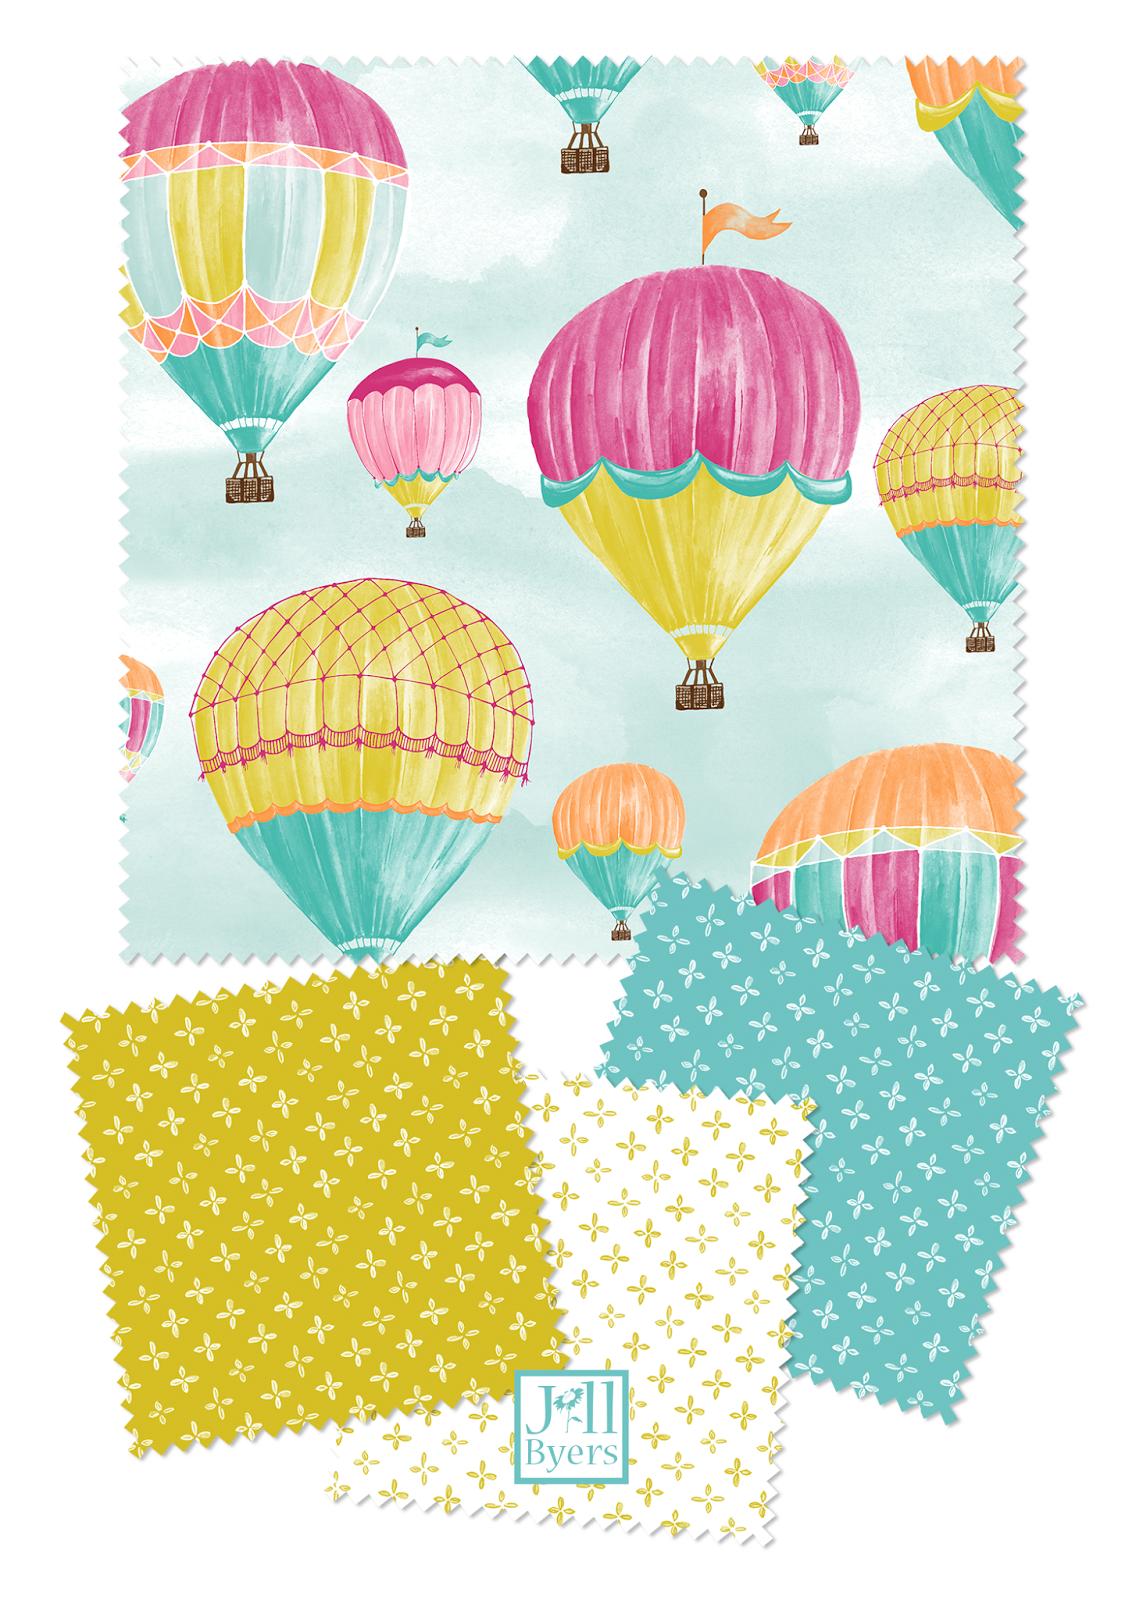 http://www.spoonflower.com/designs/4065435